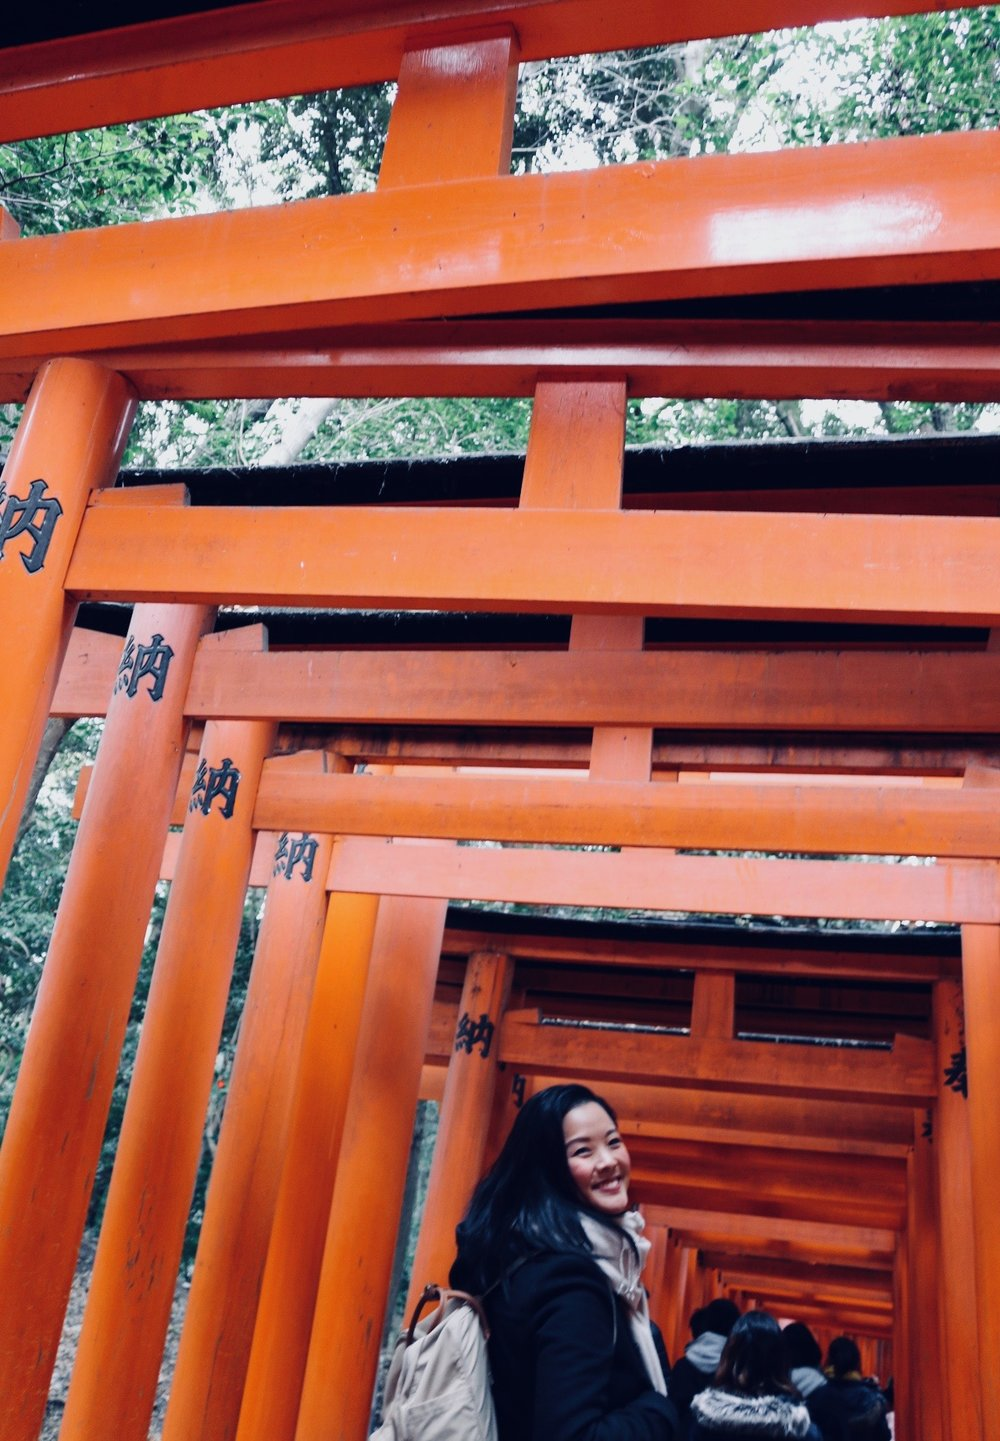 Obligatory Fushimi Inari tourist pic